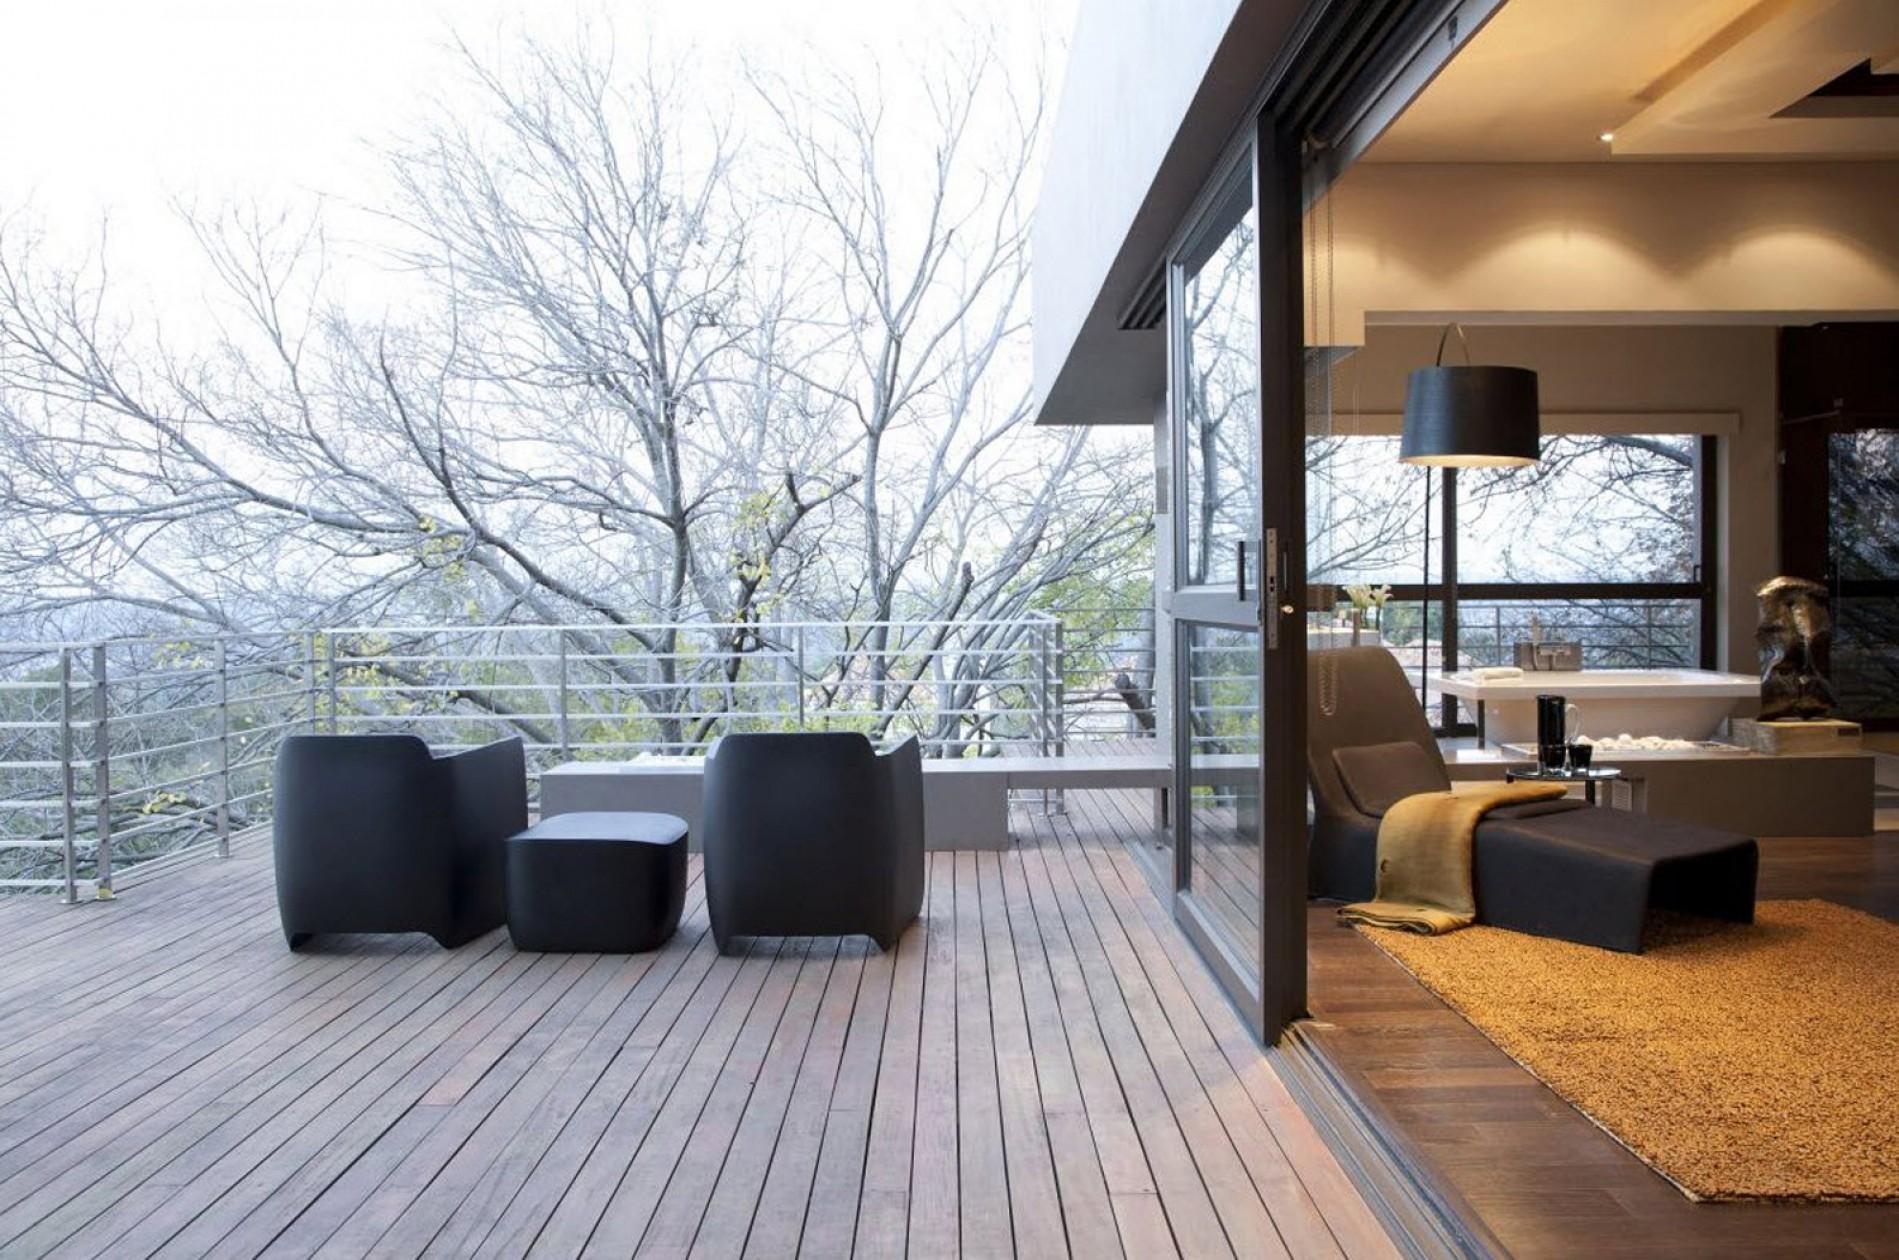 Eccleston drive residence by nico van der meulen architects .